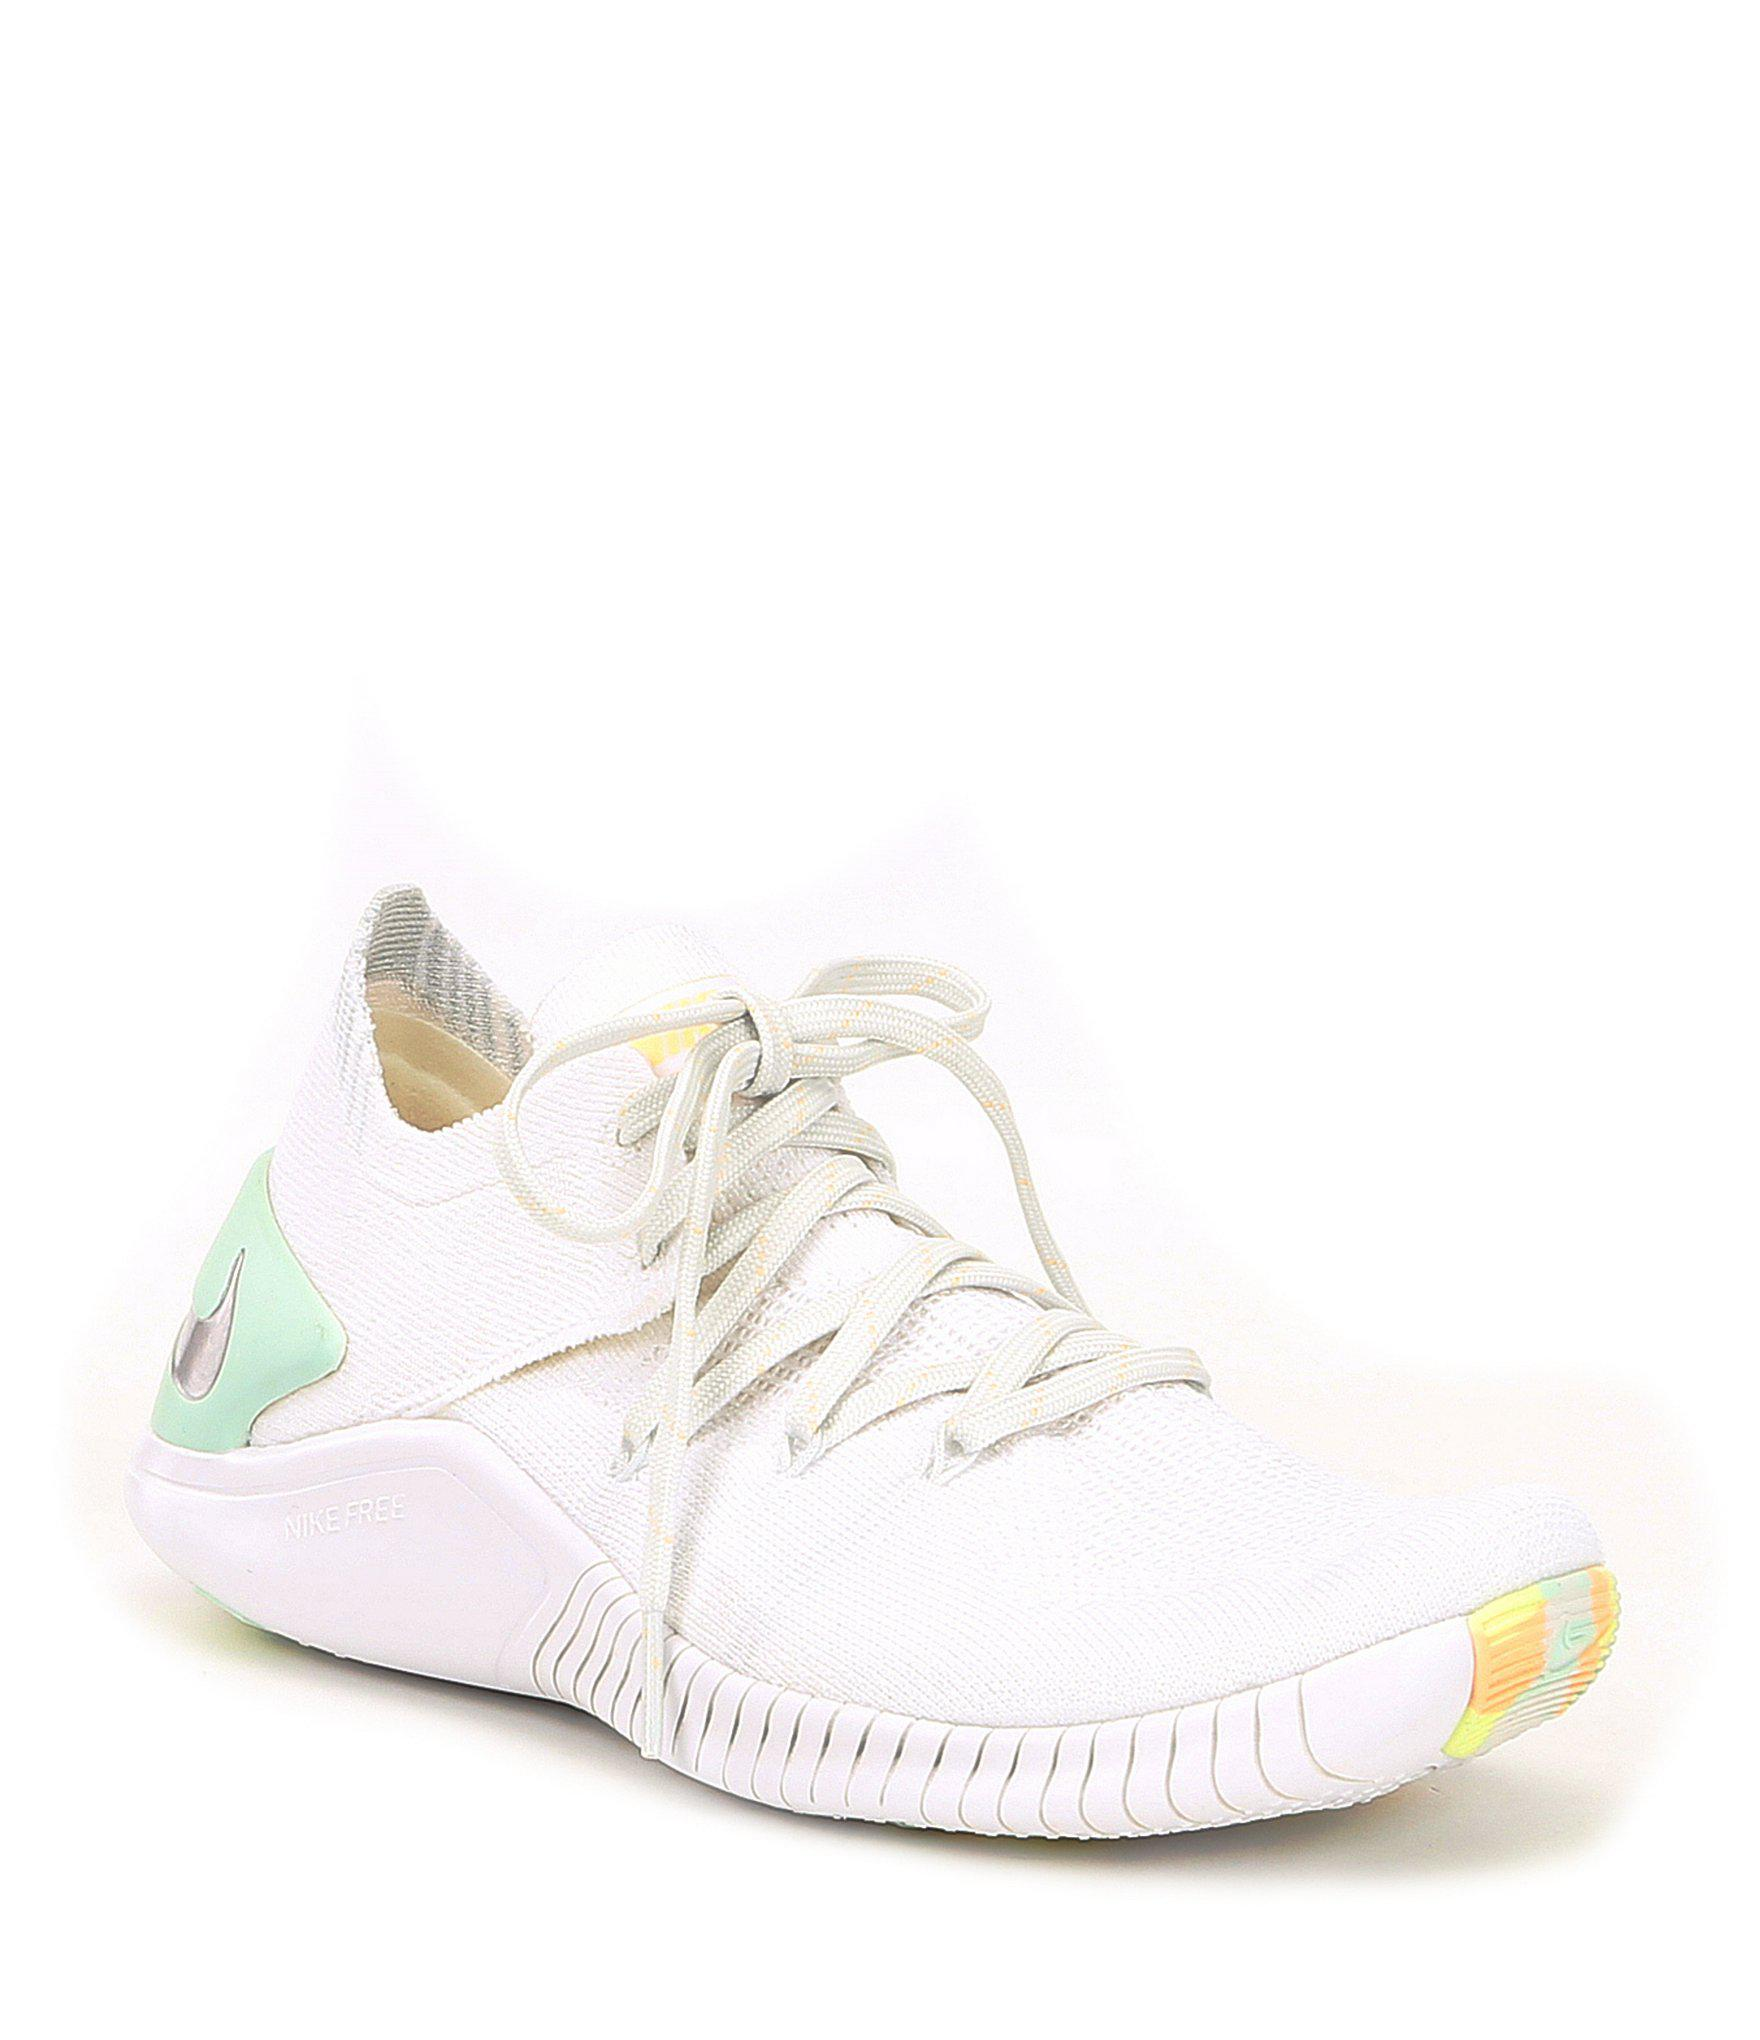 f5f9dceddd13 Lyst - Nike Women s Free Tr Flyknit 3 Rise Training Shoes in White